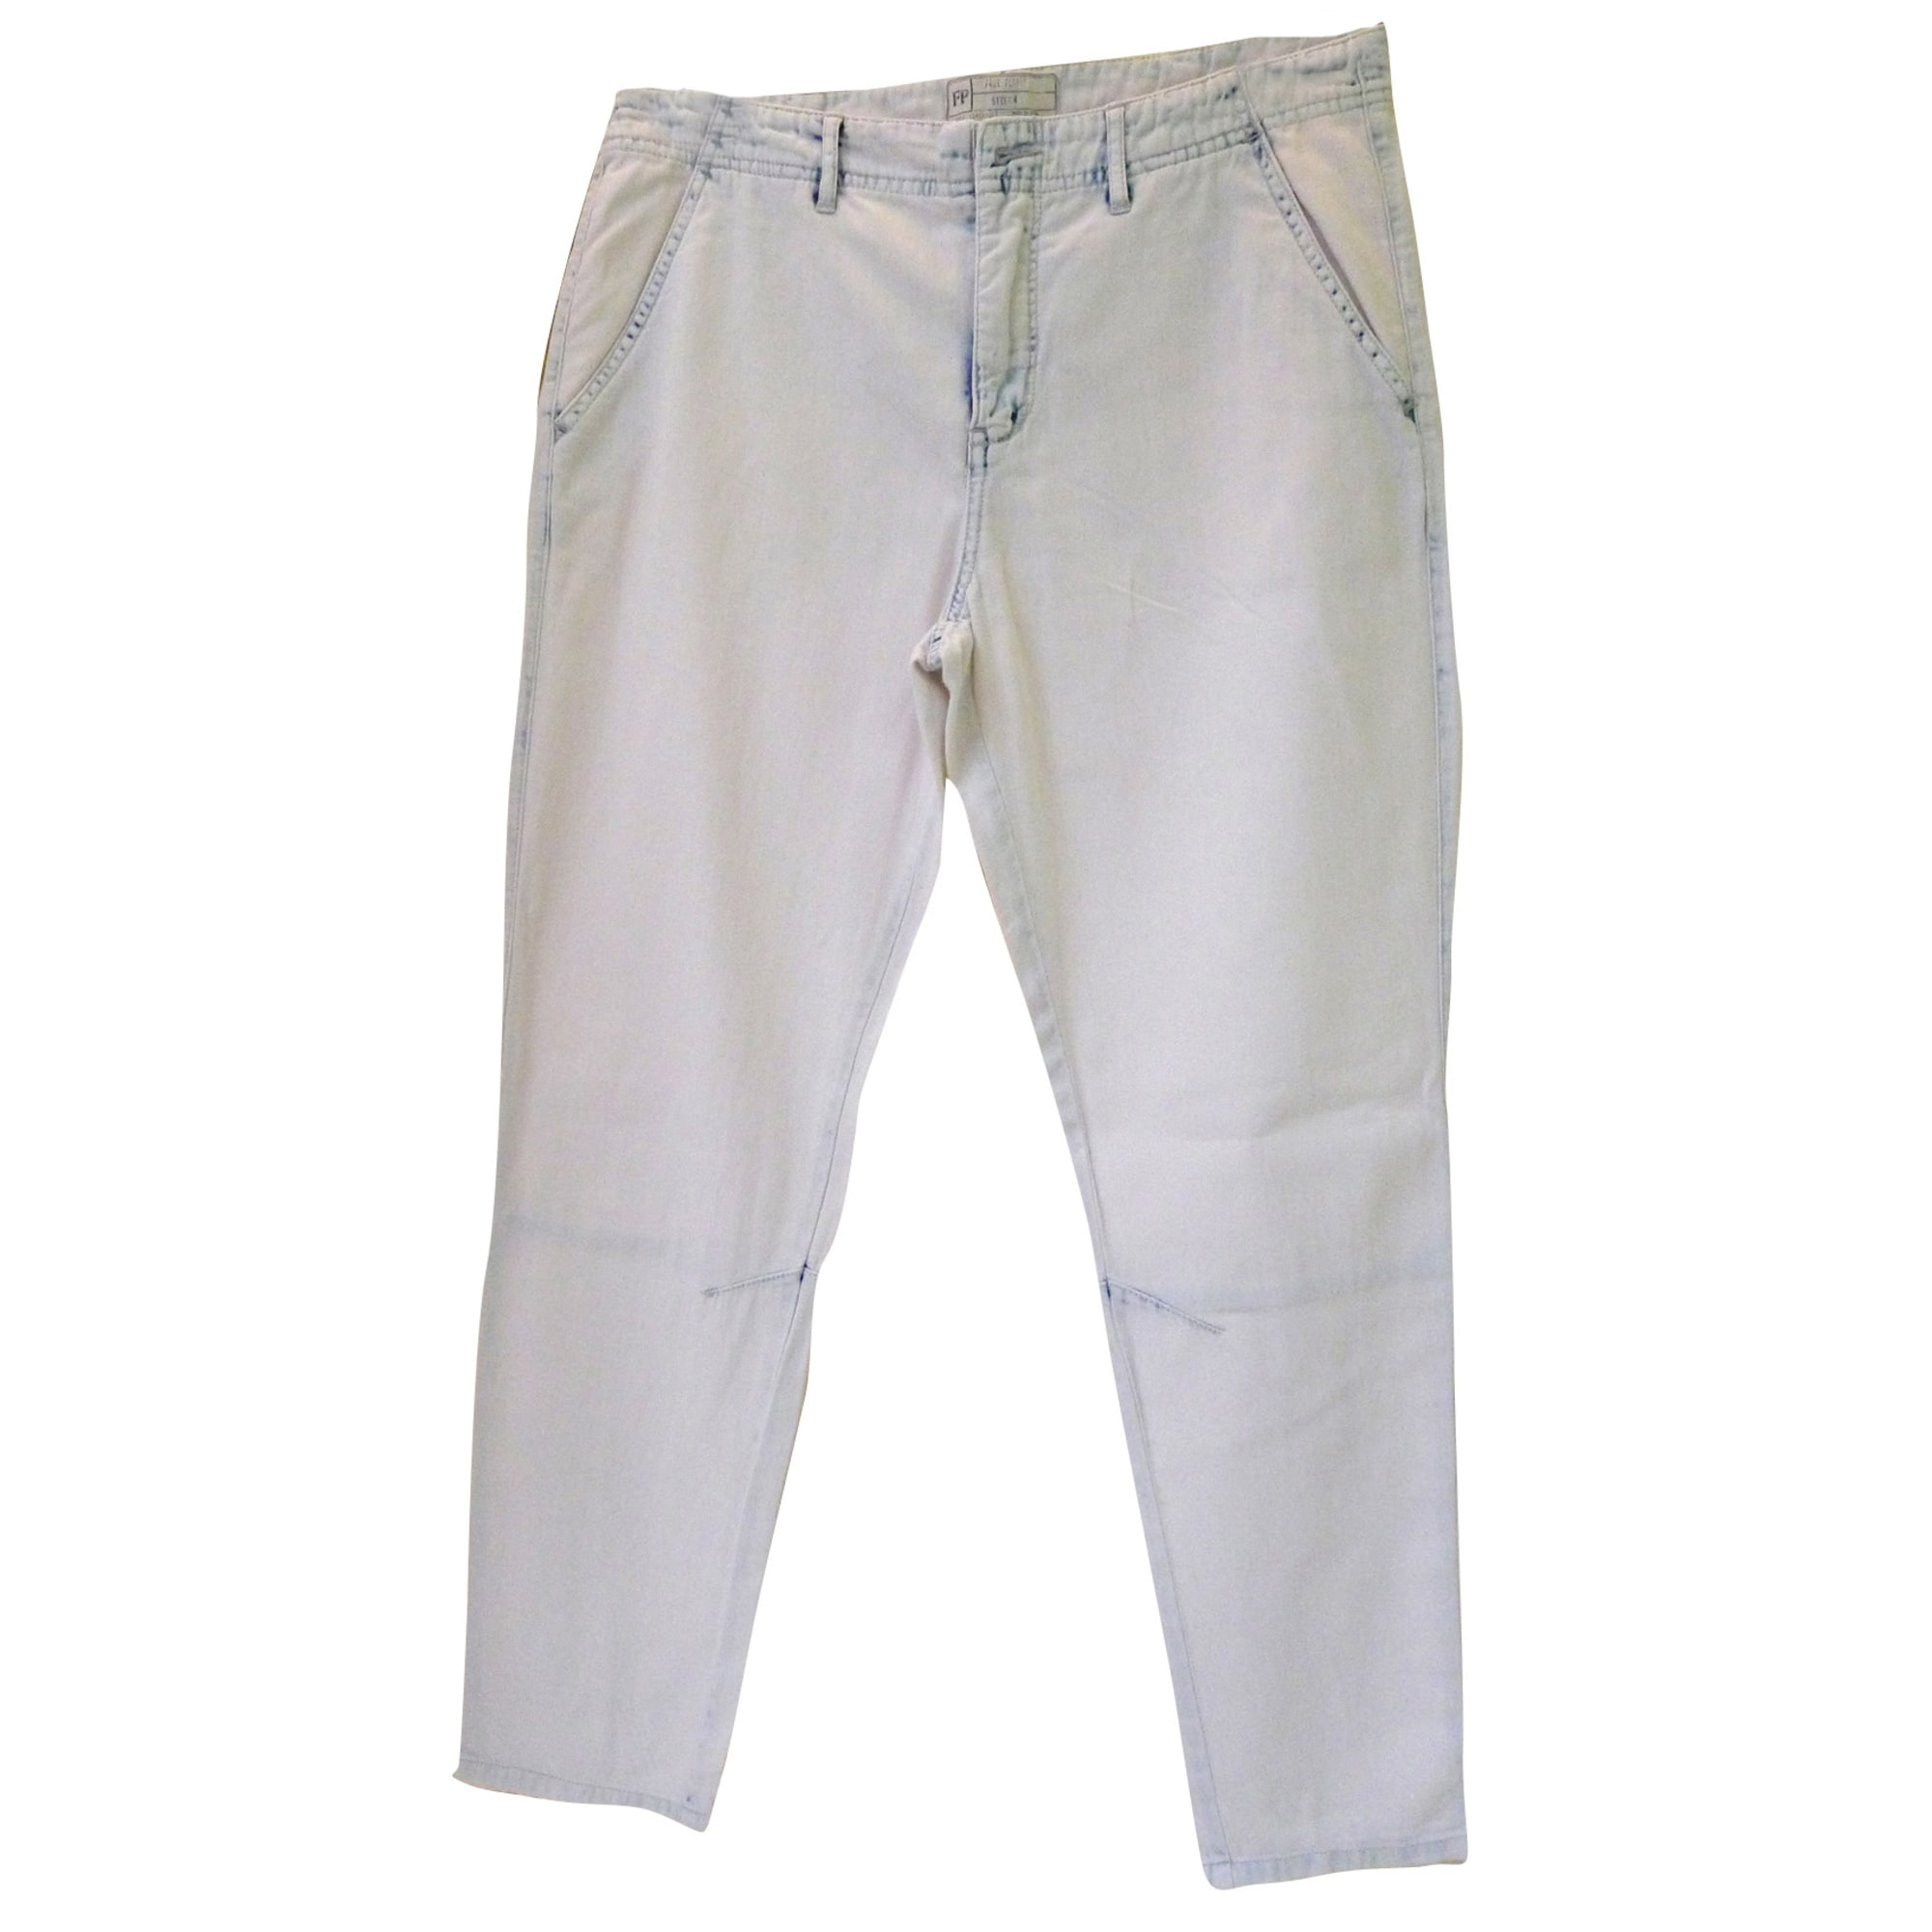 Pantalon large FREE PEOPLE Blanc, blanc cassé, écru